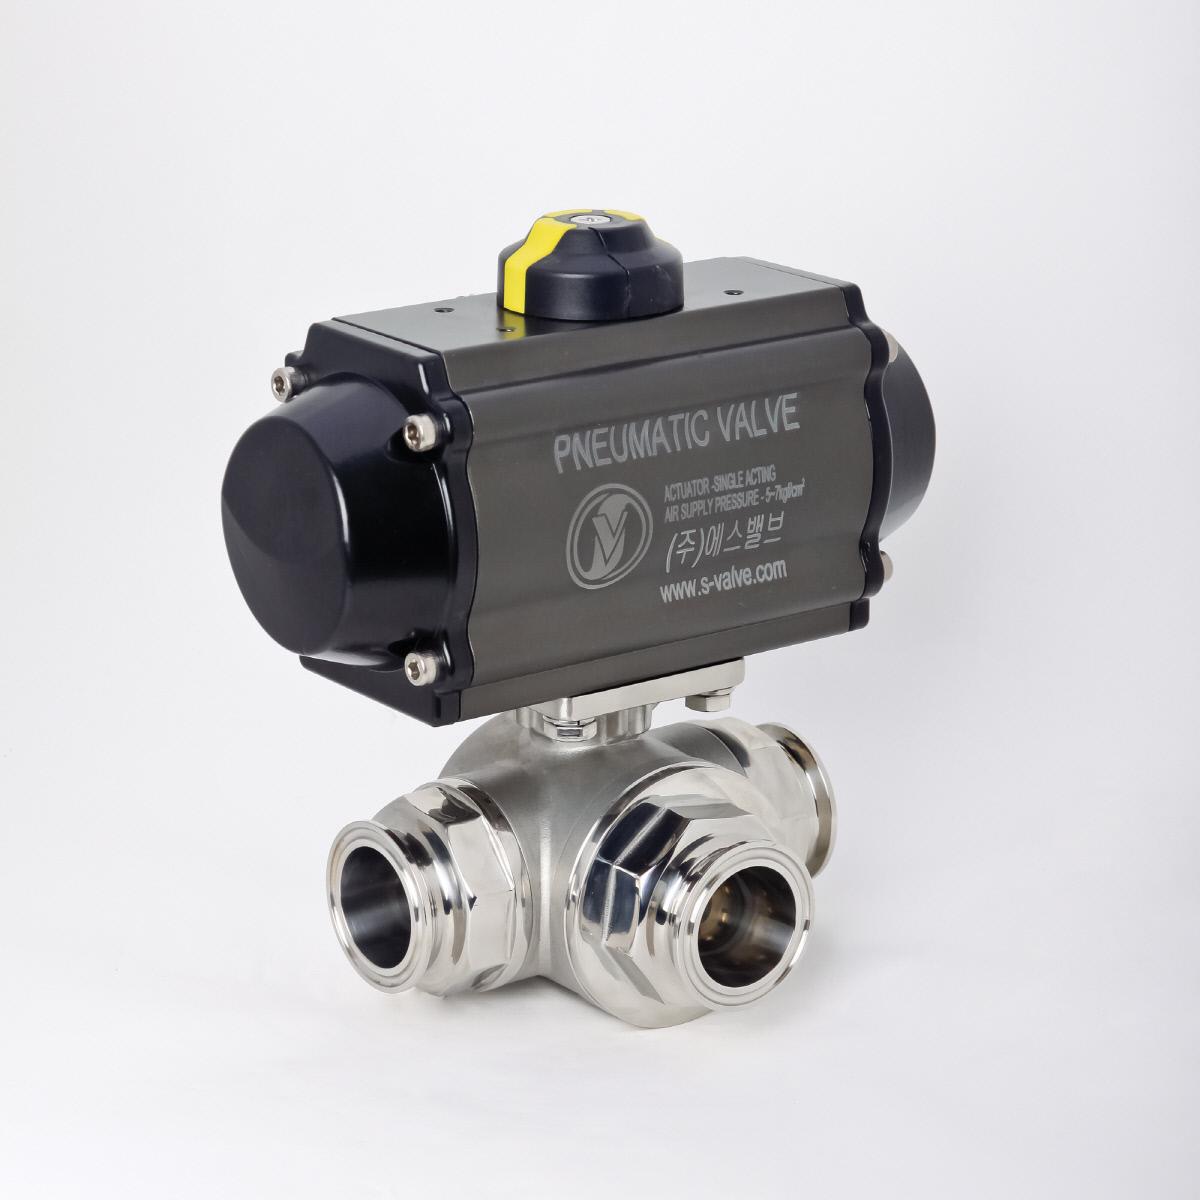 S-valve_0089.jpg